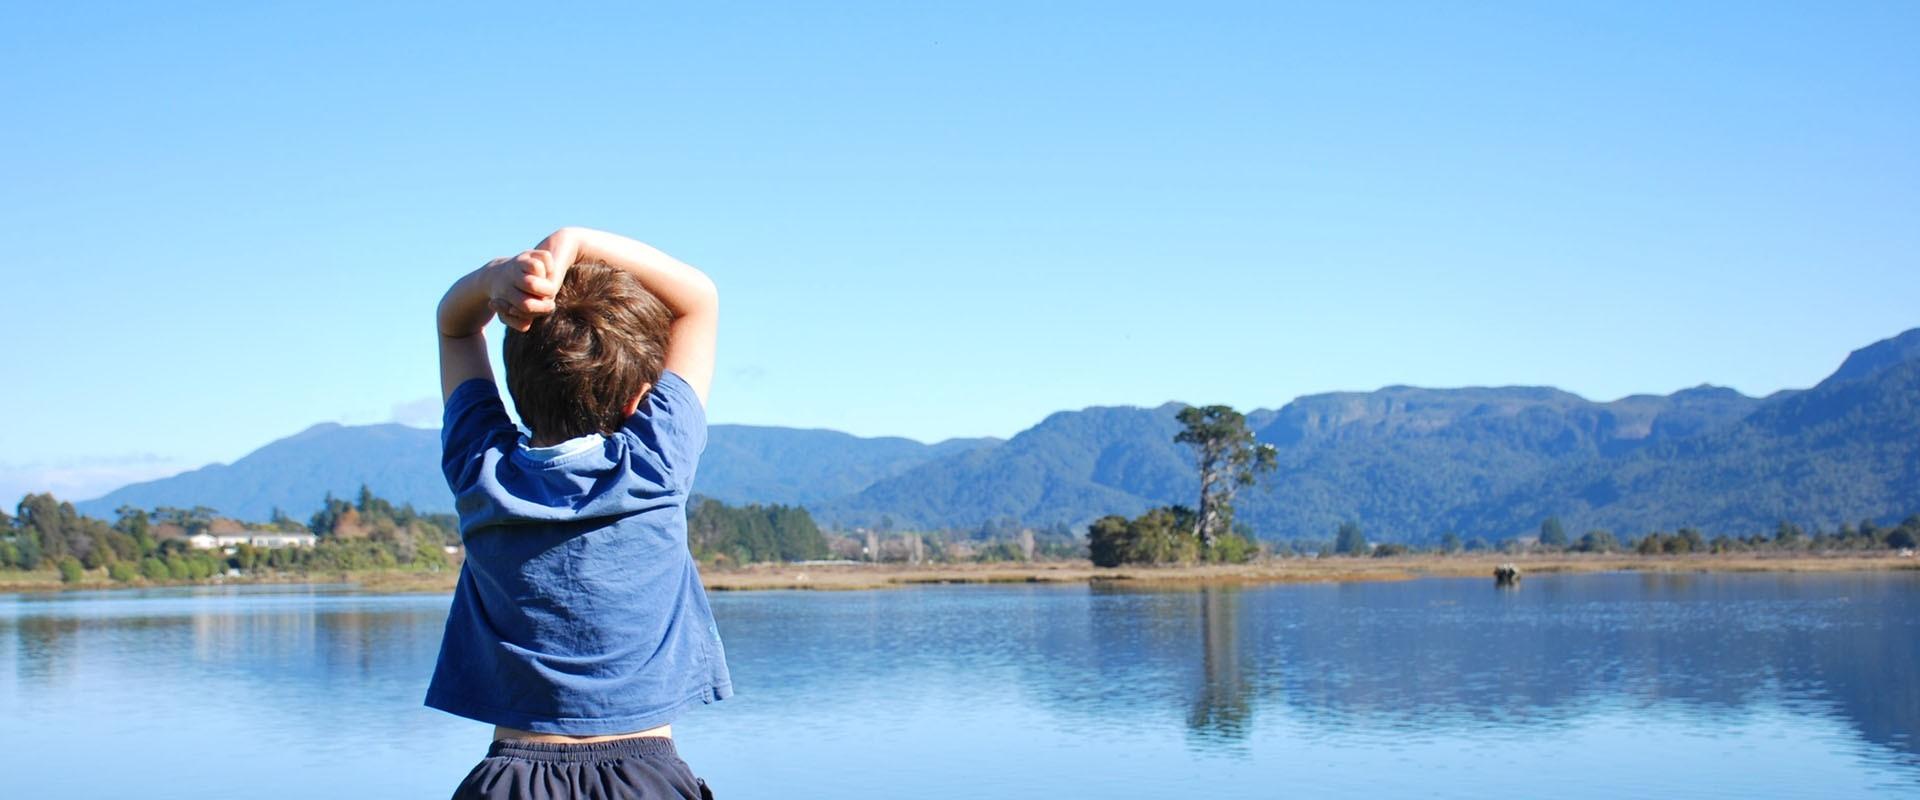 New Zealand School Holidays 2020 - Publicholidays.co.nz-Nz School Holidays 2020 Calendar